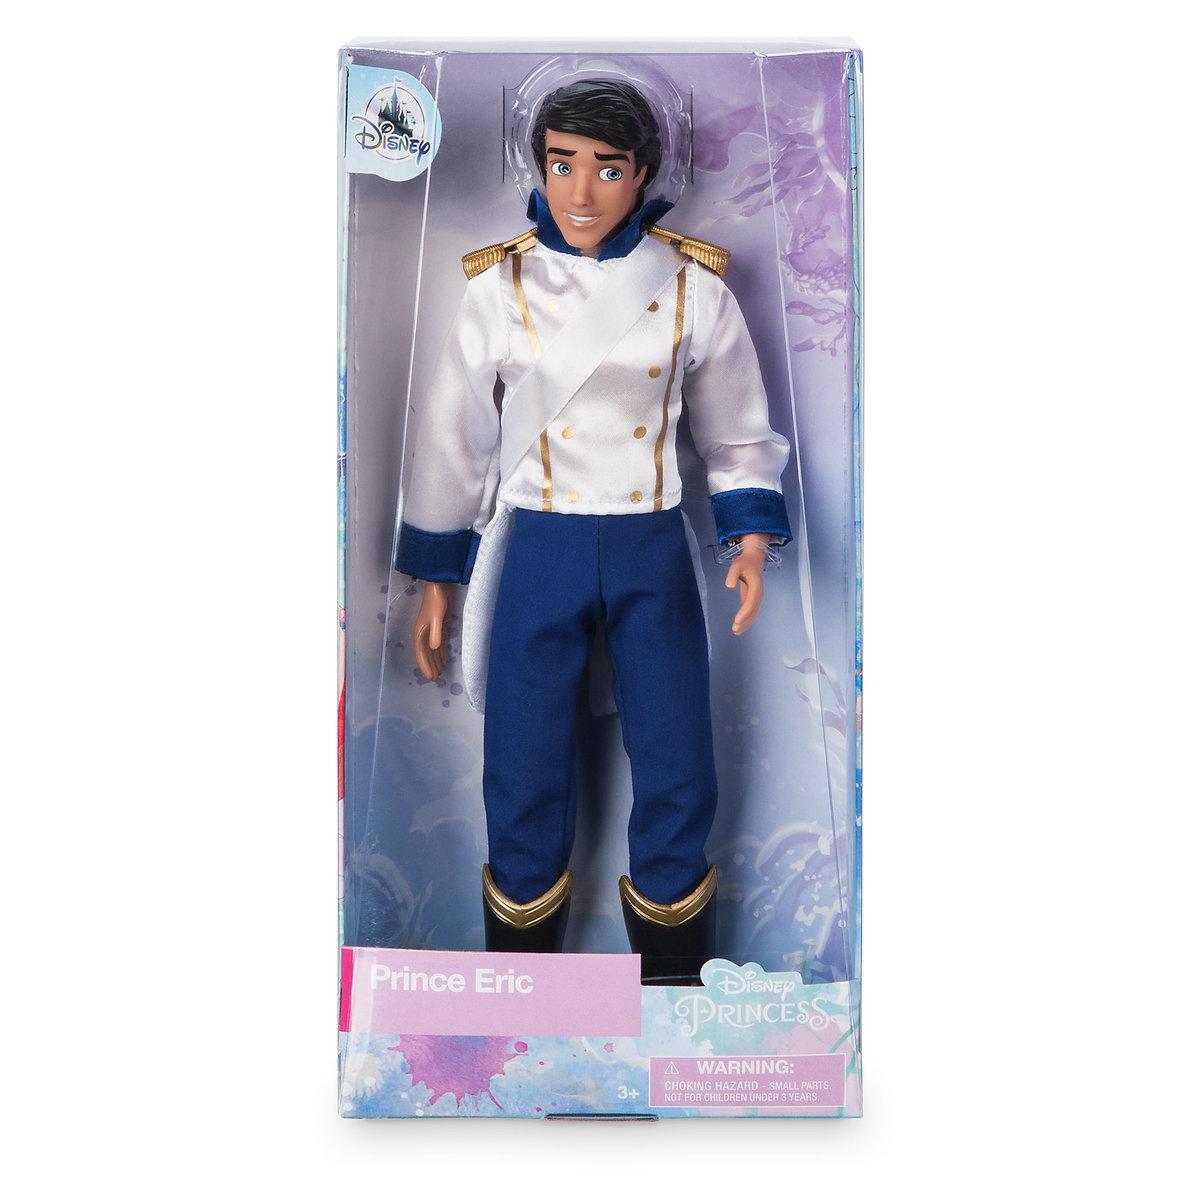 Prince Eric Classic Doll - The Little Mermaid - 12'' ของแท้ นำเข้าจากอเมริกา